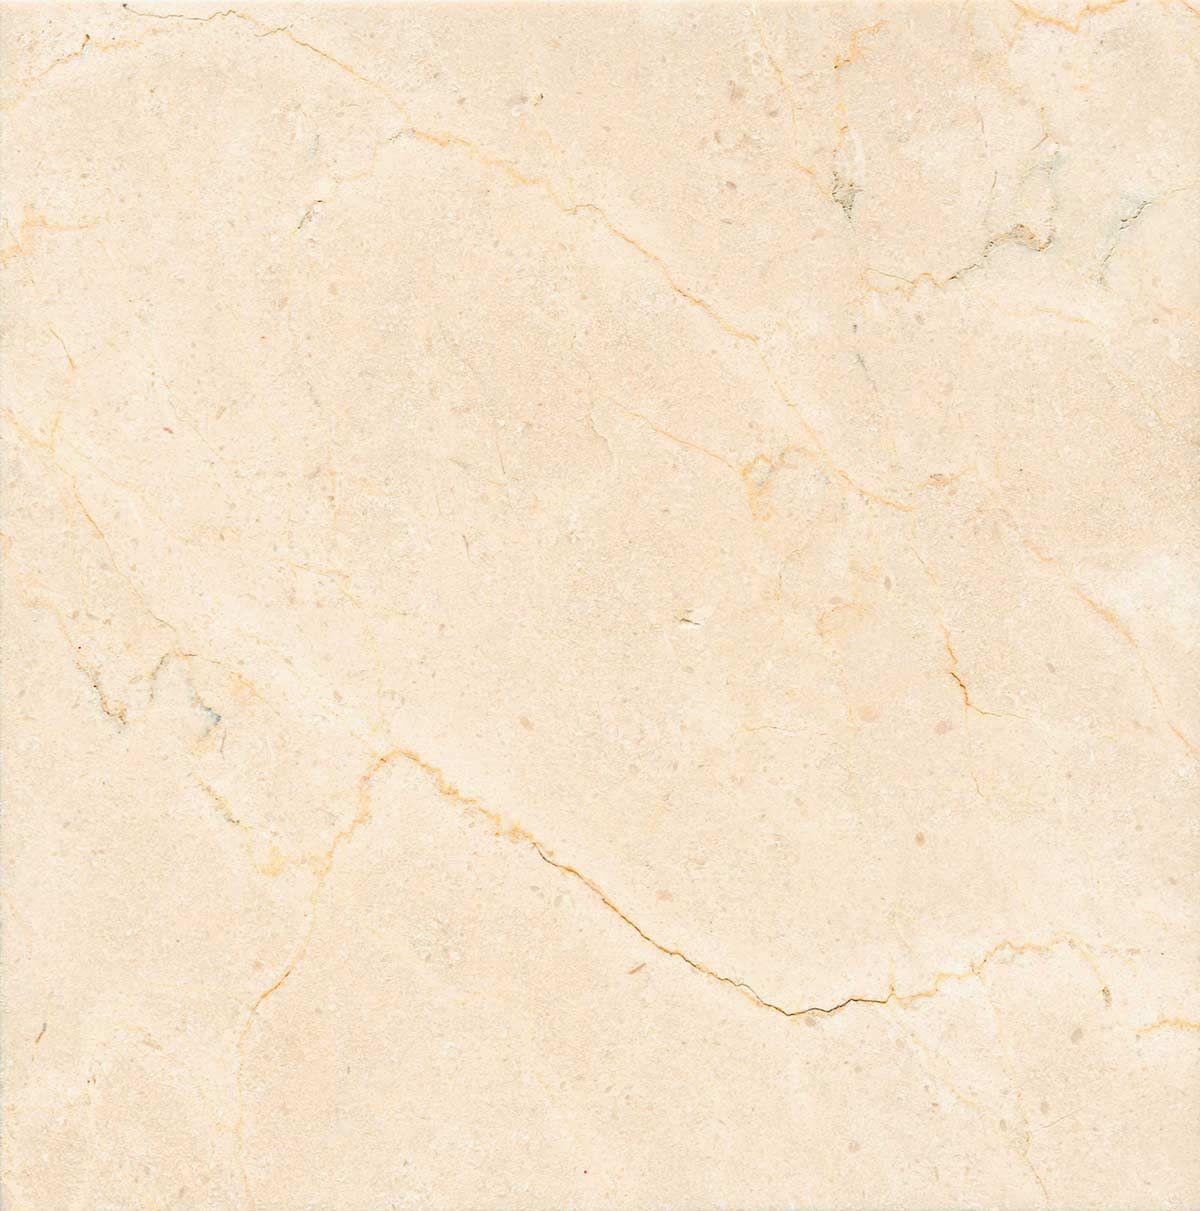 Muestra del m rmol crema marfil ofrecido por natural stone for Textura del marmol